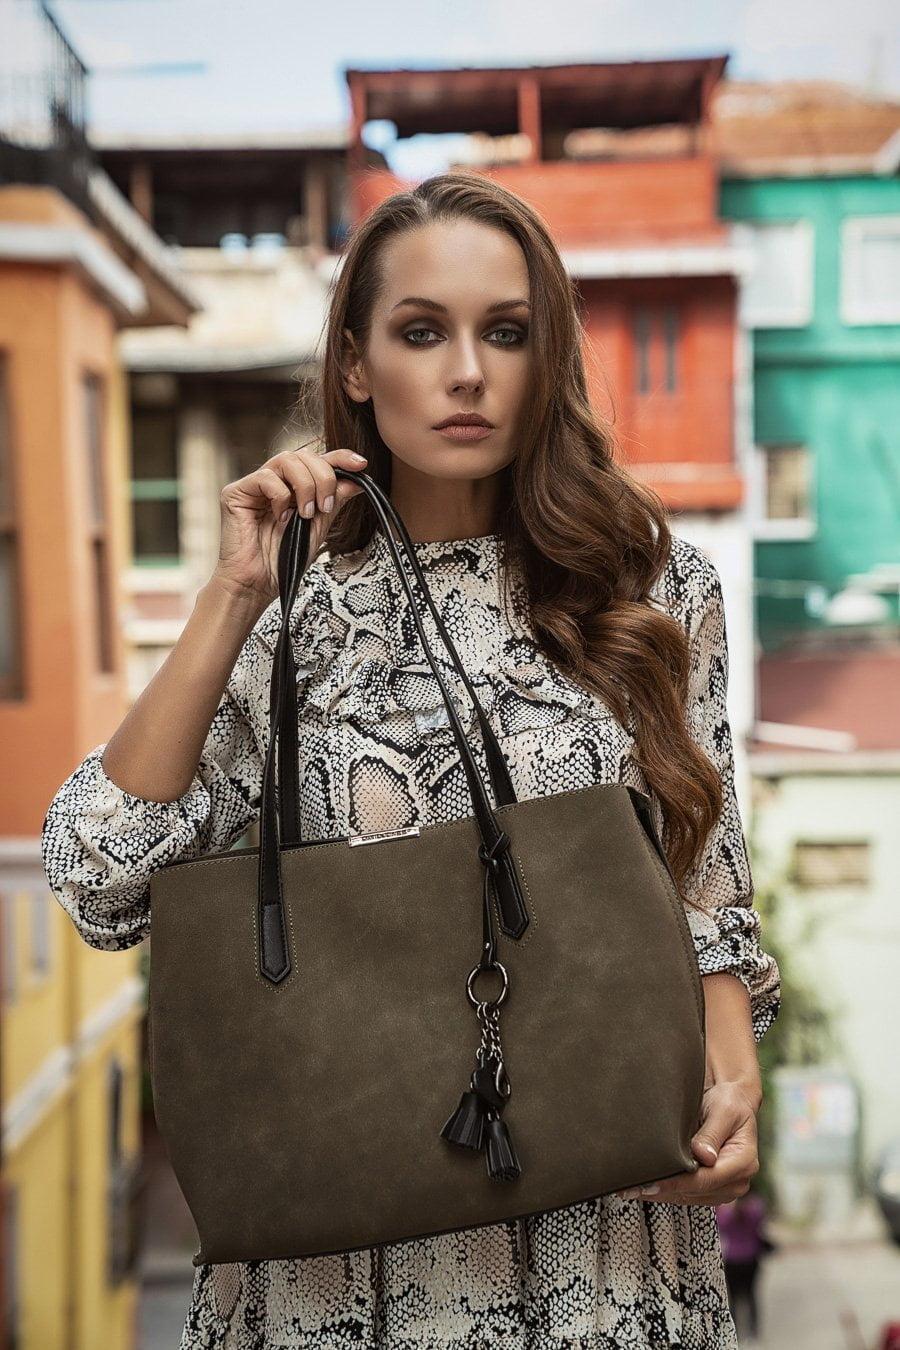 Moda Çekimi - Editorial - Beauty moda tekstil burakbulutfotografatolyesi 18